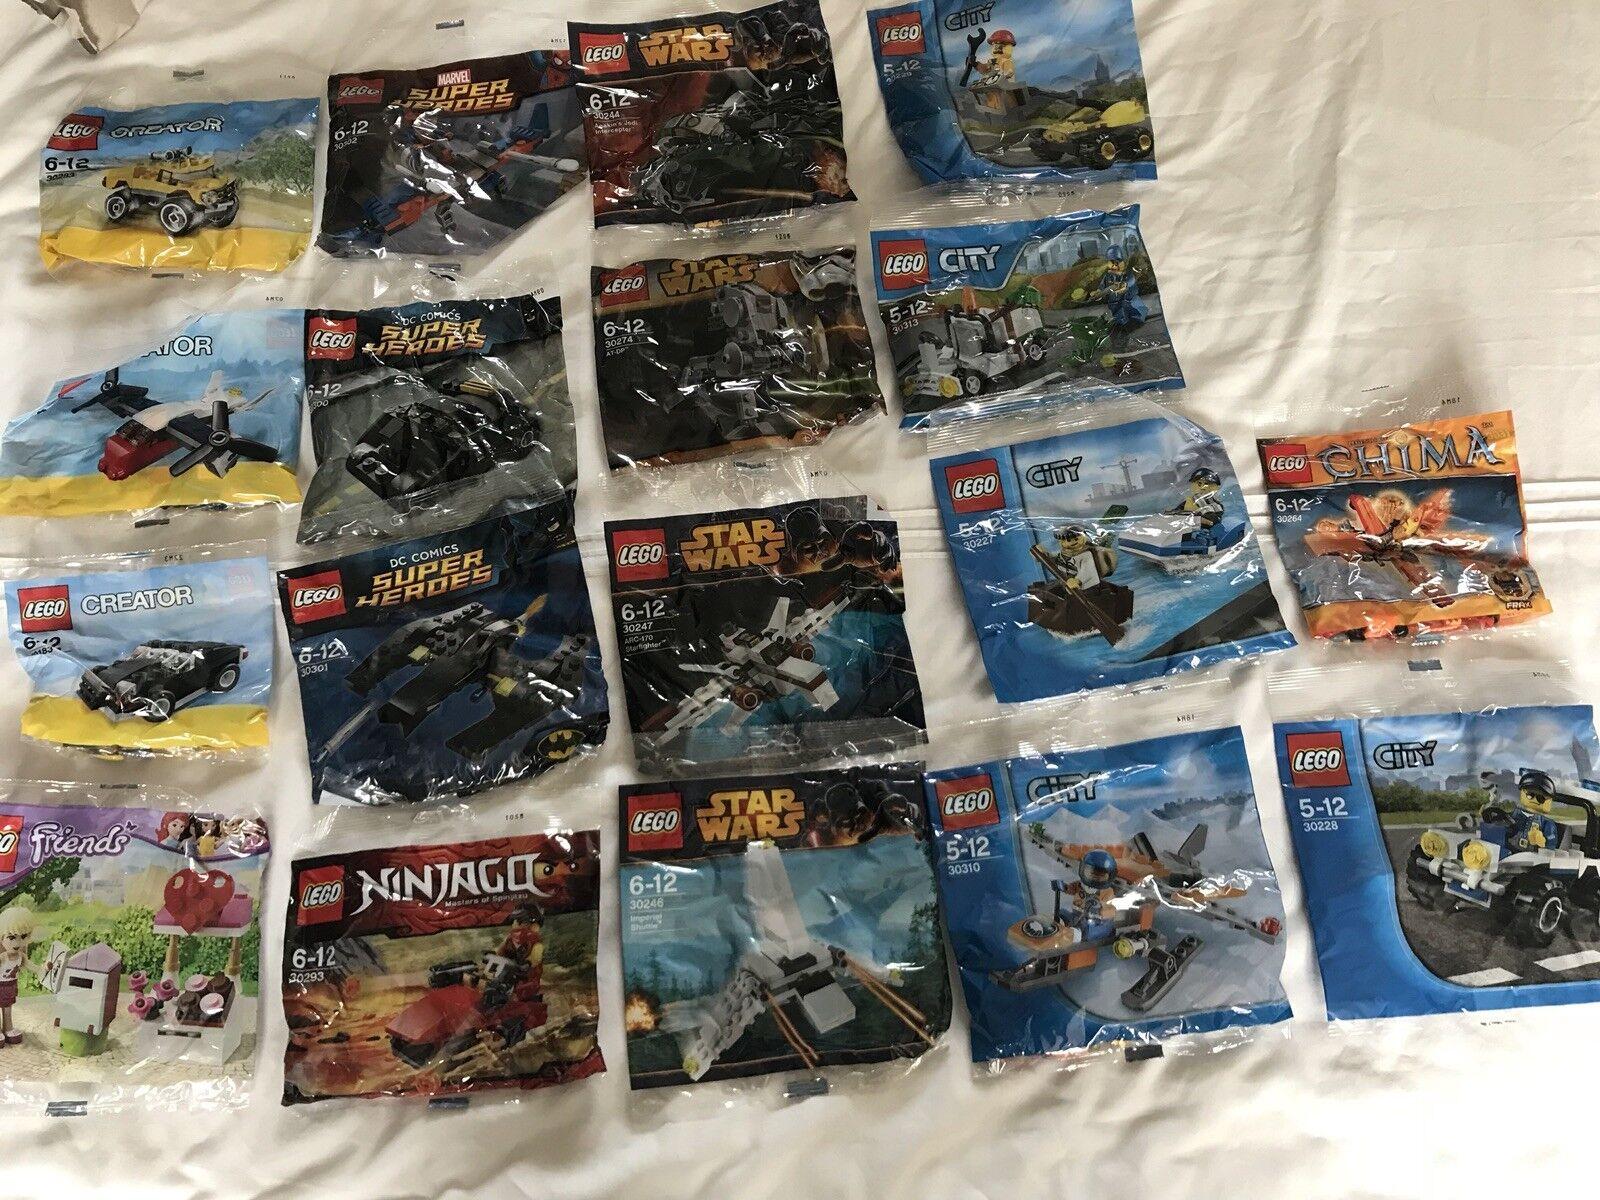 Lego polybag bundle Starwars Batman Spider-Man City